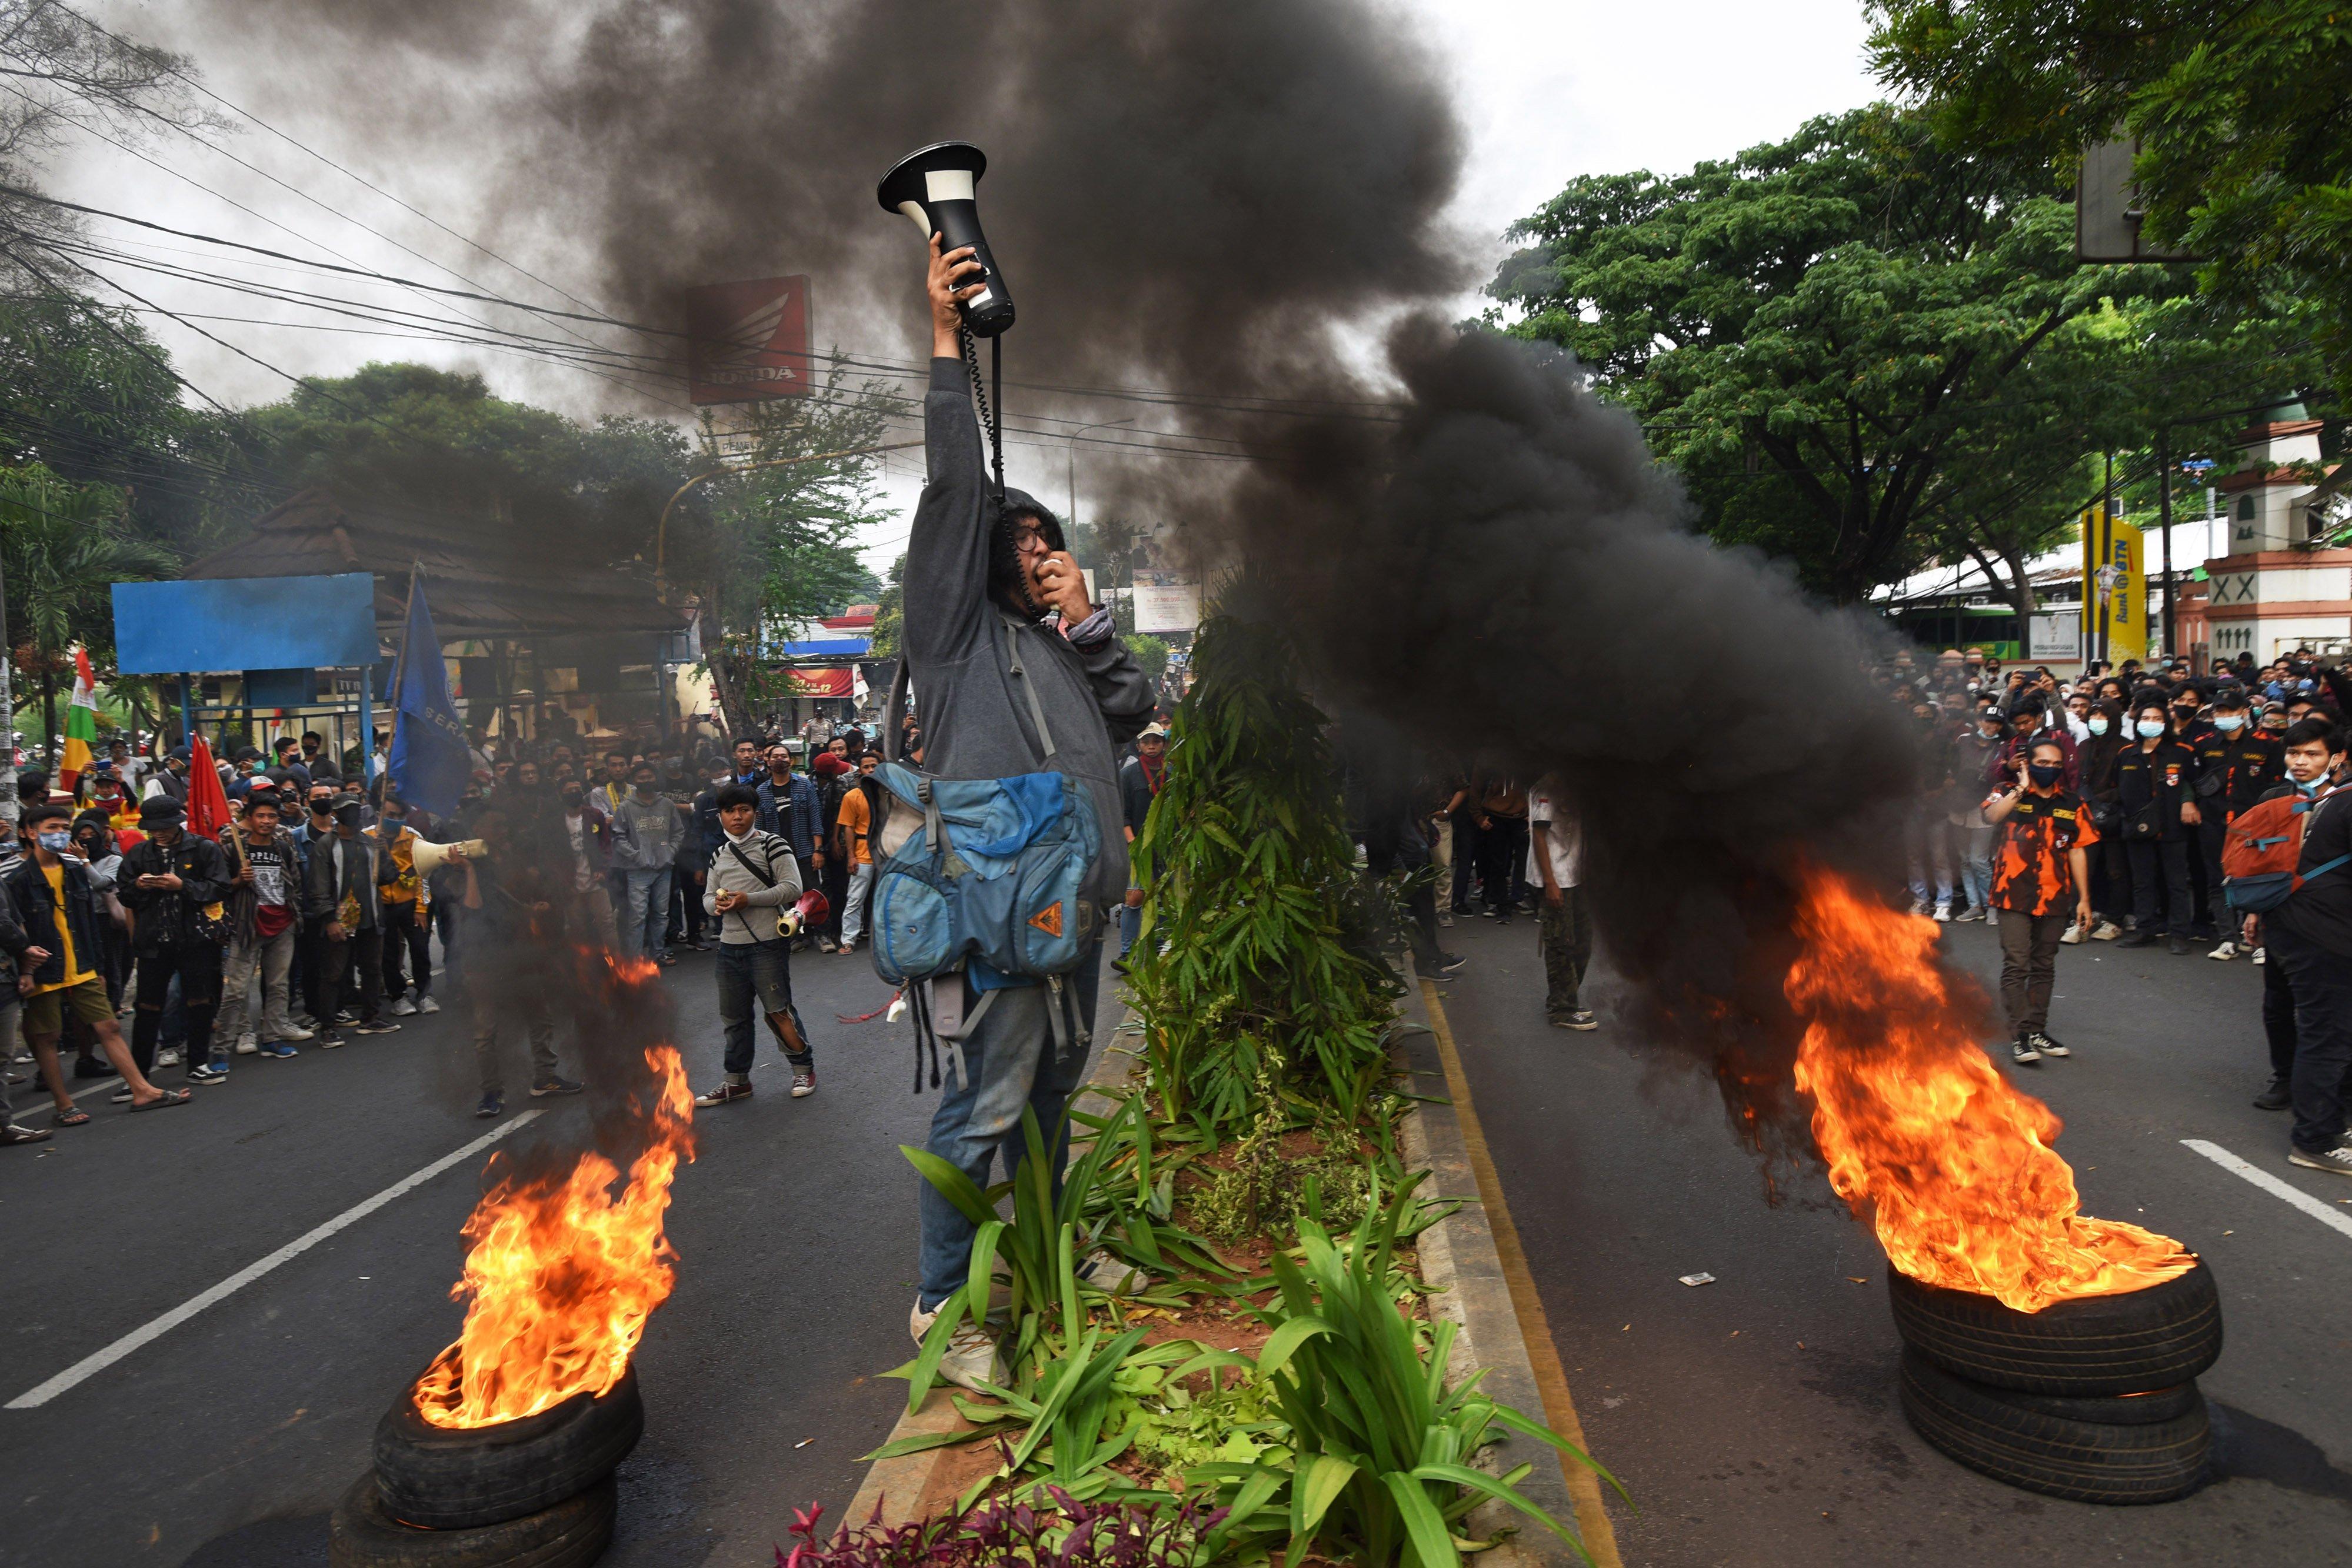 Ratusan mahasiswa dan buruh yang tergabung dalam Aliansi Rakyat Bersatu berunjuk rasa menolak pengesahan Omnibus Law Undang-undang Cipta Kerja, di Alun-alun Serang, Banten, Selasa (6/10/2020). Mereka mendesak pemerintah dan DPR membatalkan Undang-undang tersebut serta menyerukan semua lapisan masyarakat untuk menolaknya karena dinilai sangat merugikan buruh. ANTARA FOTO/Asep Fathulrahman/hp.